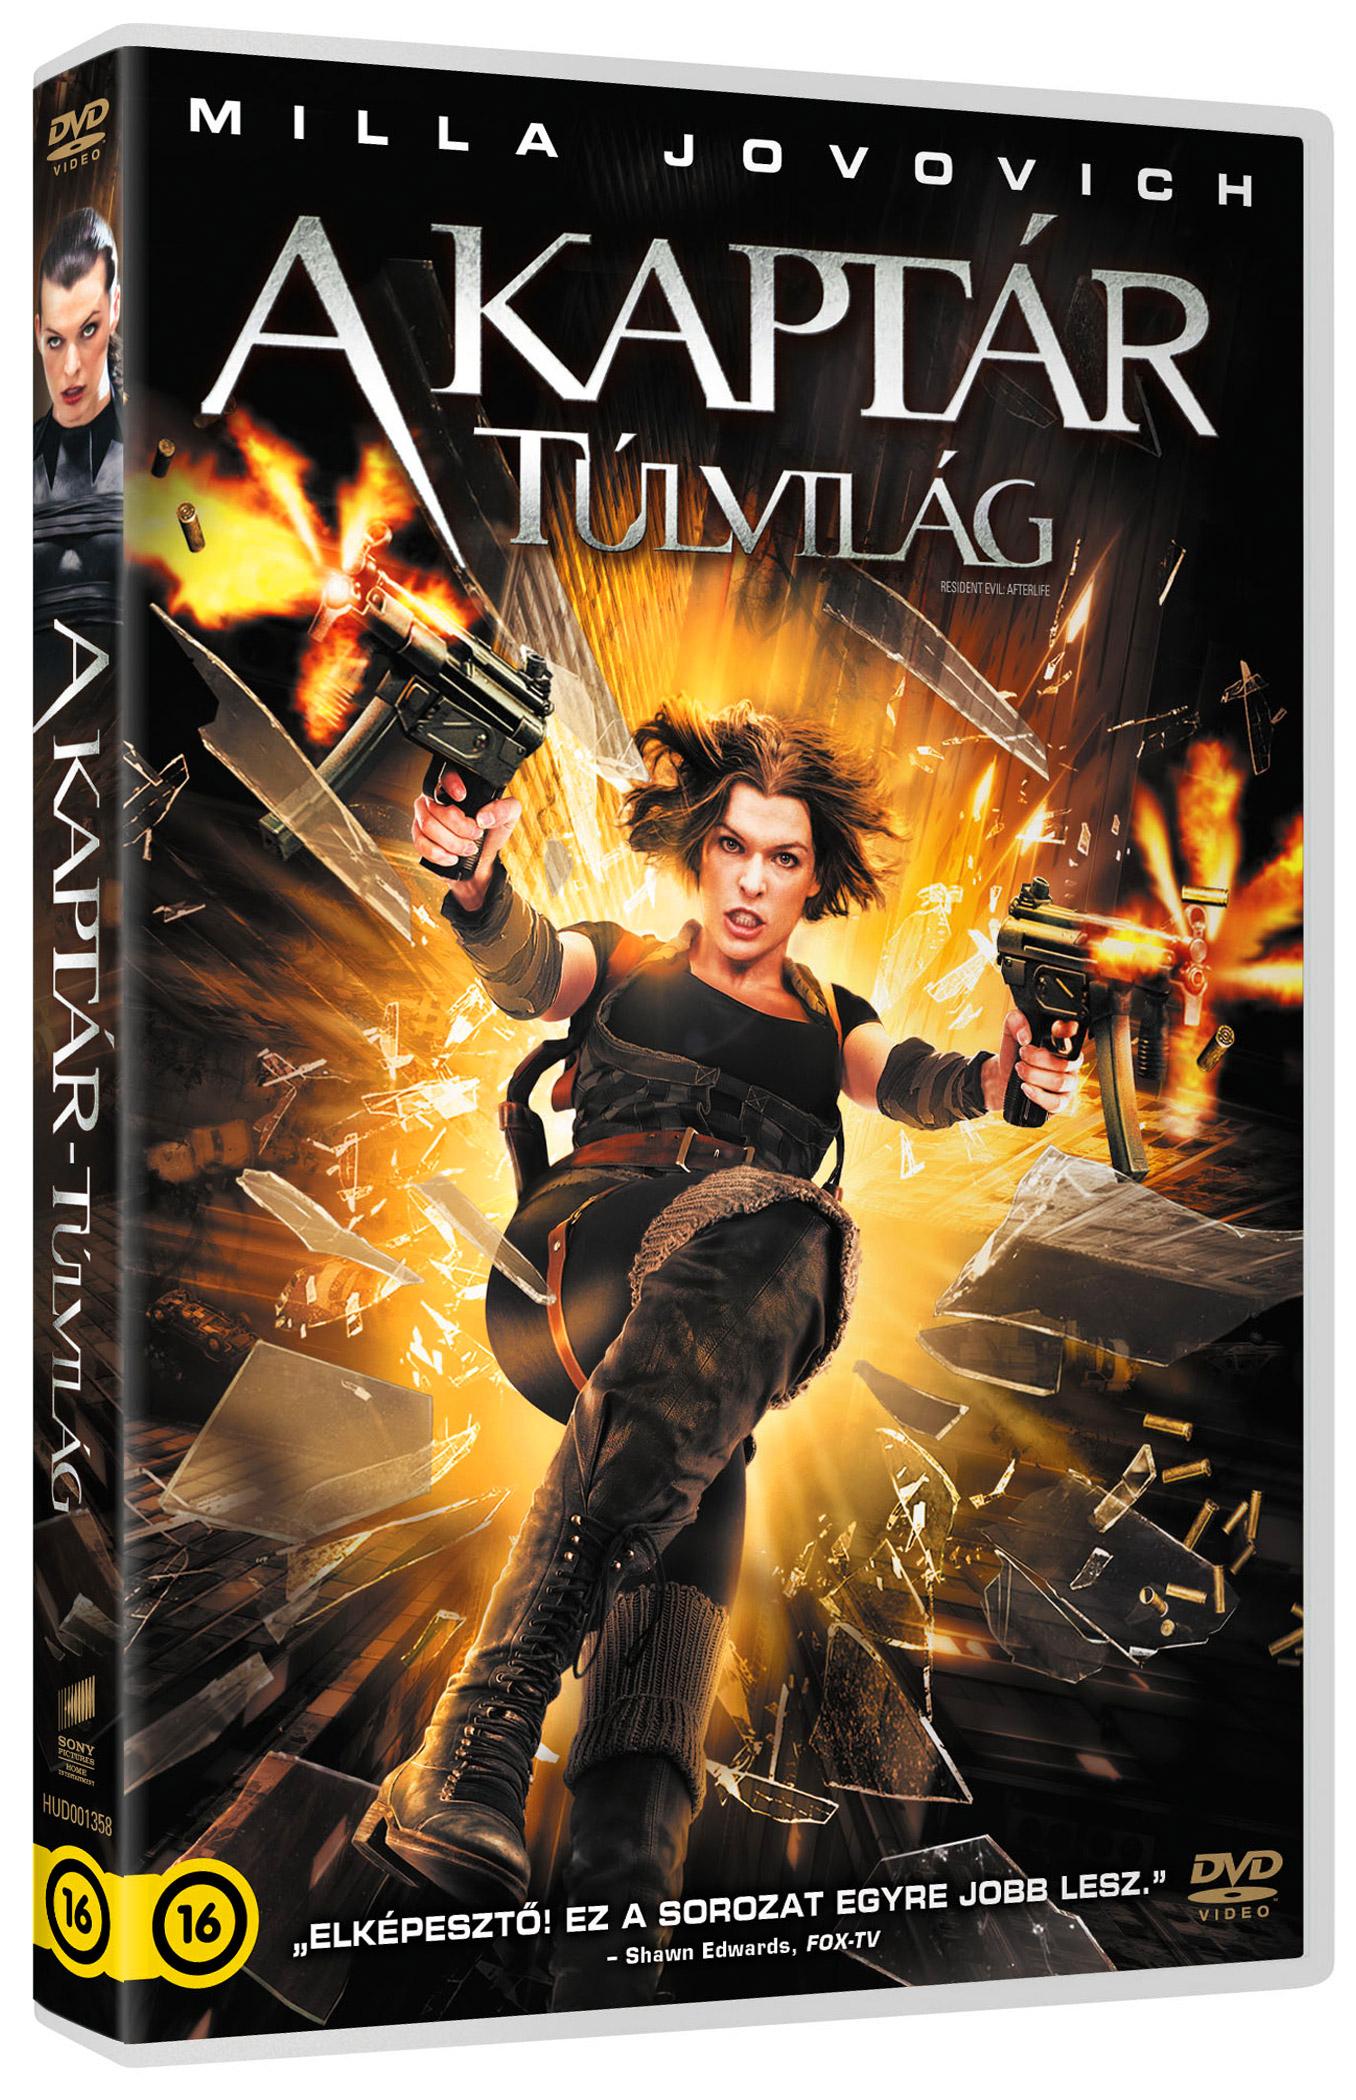 A Kapt�r: T�lvil�g DVD